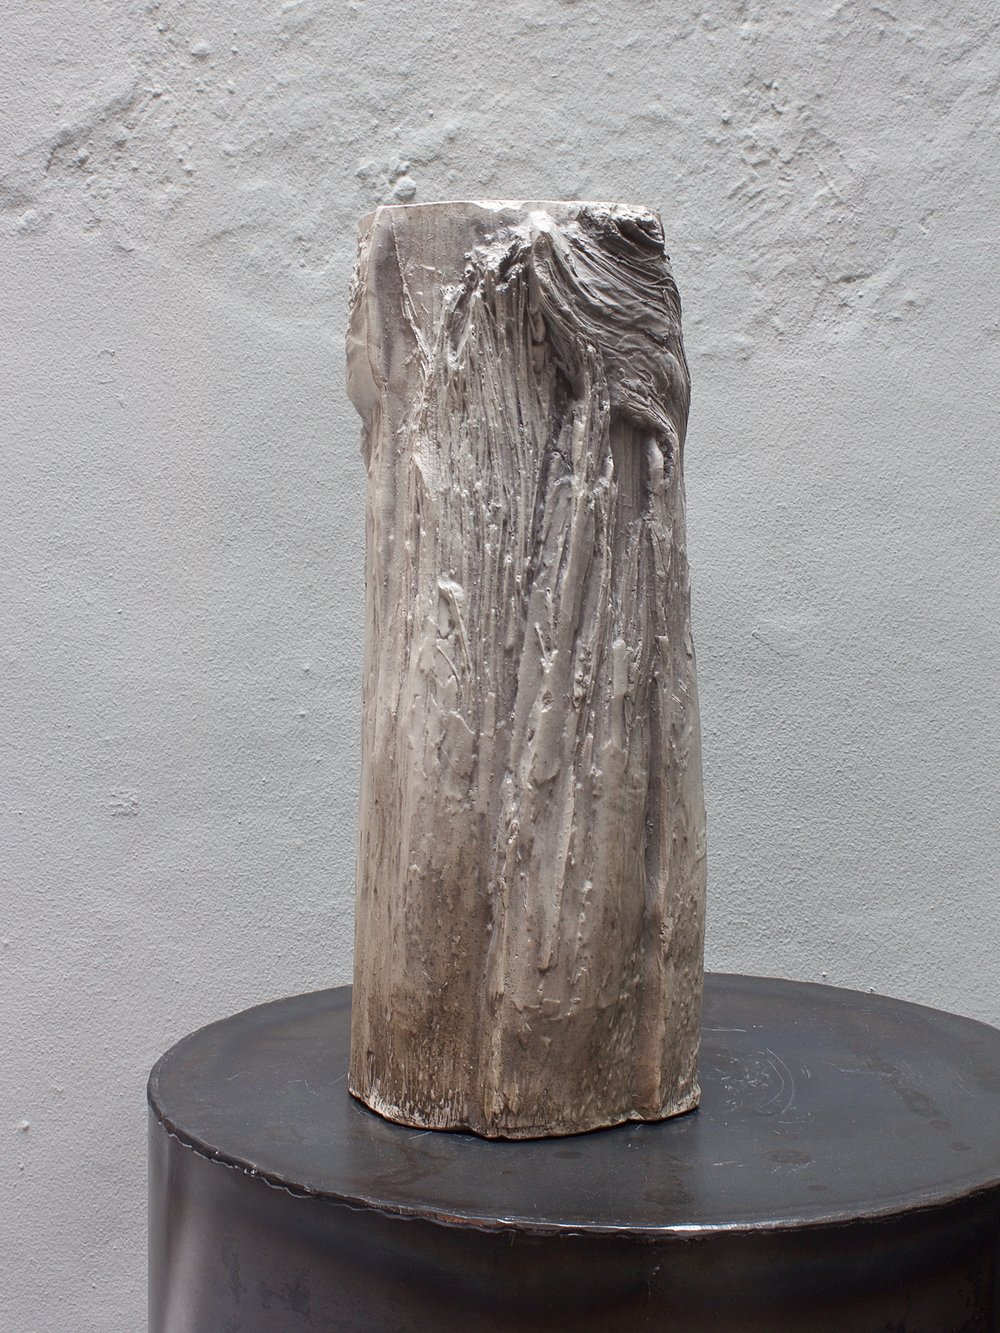 Bark Vase <i><br>7.700 DKK </i>